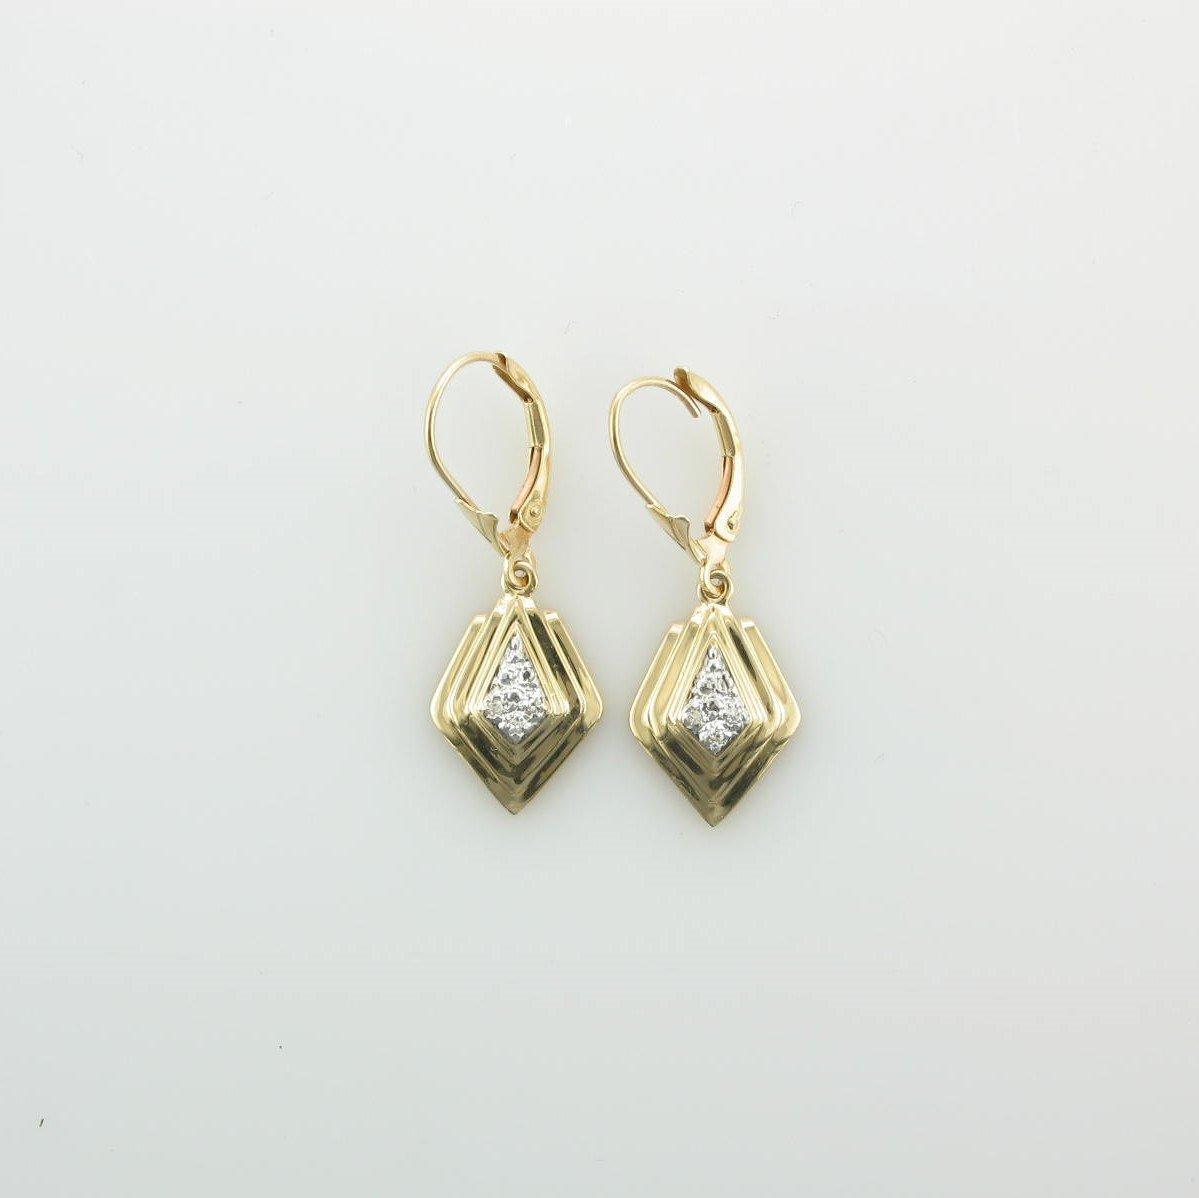 Two Tone Kite Shaped Diamond Earrings set in 14K Yellow Gold